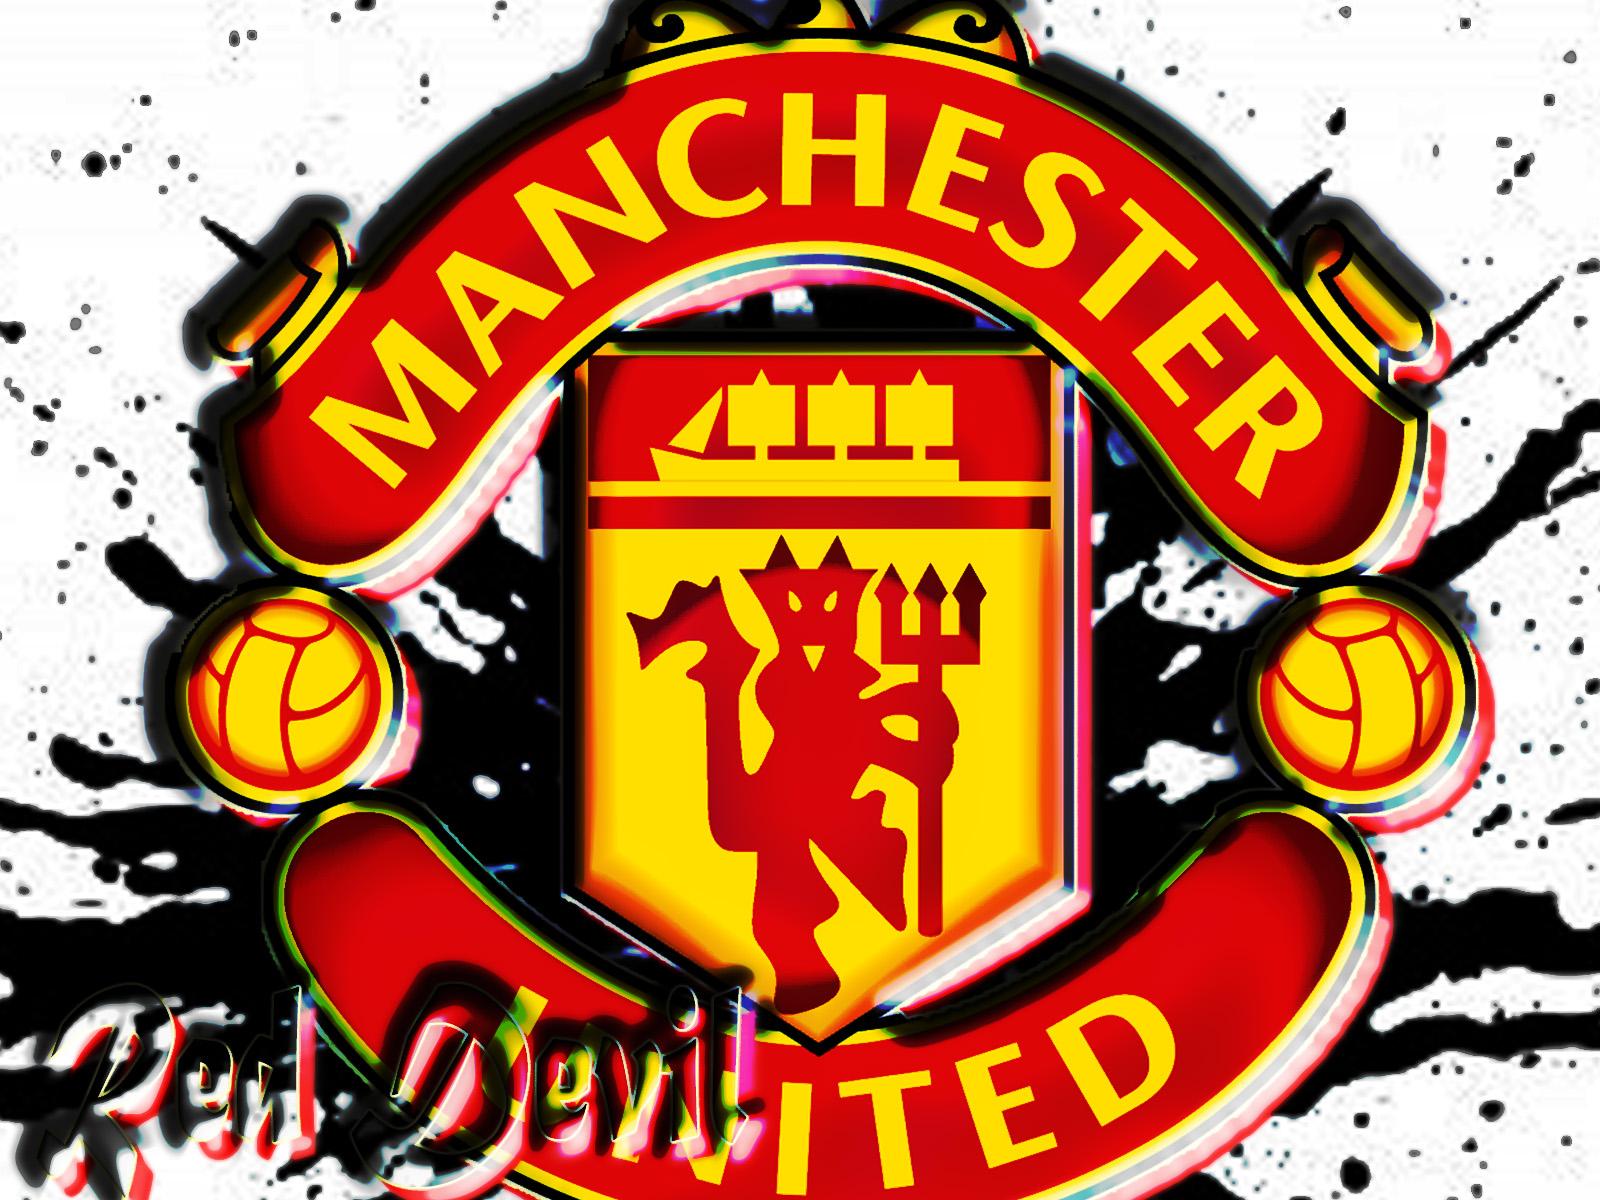 Manchester united wallpaper for bedroom